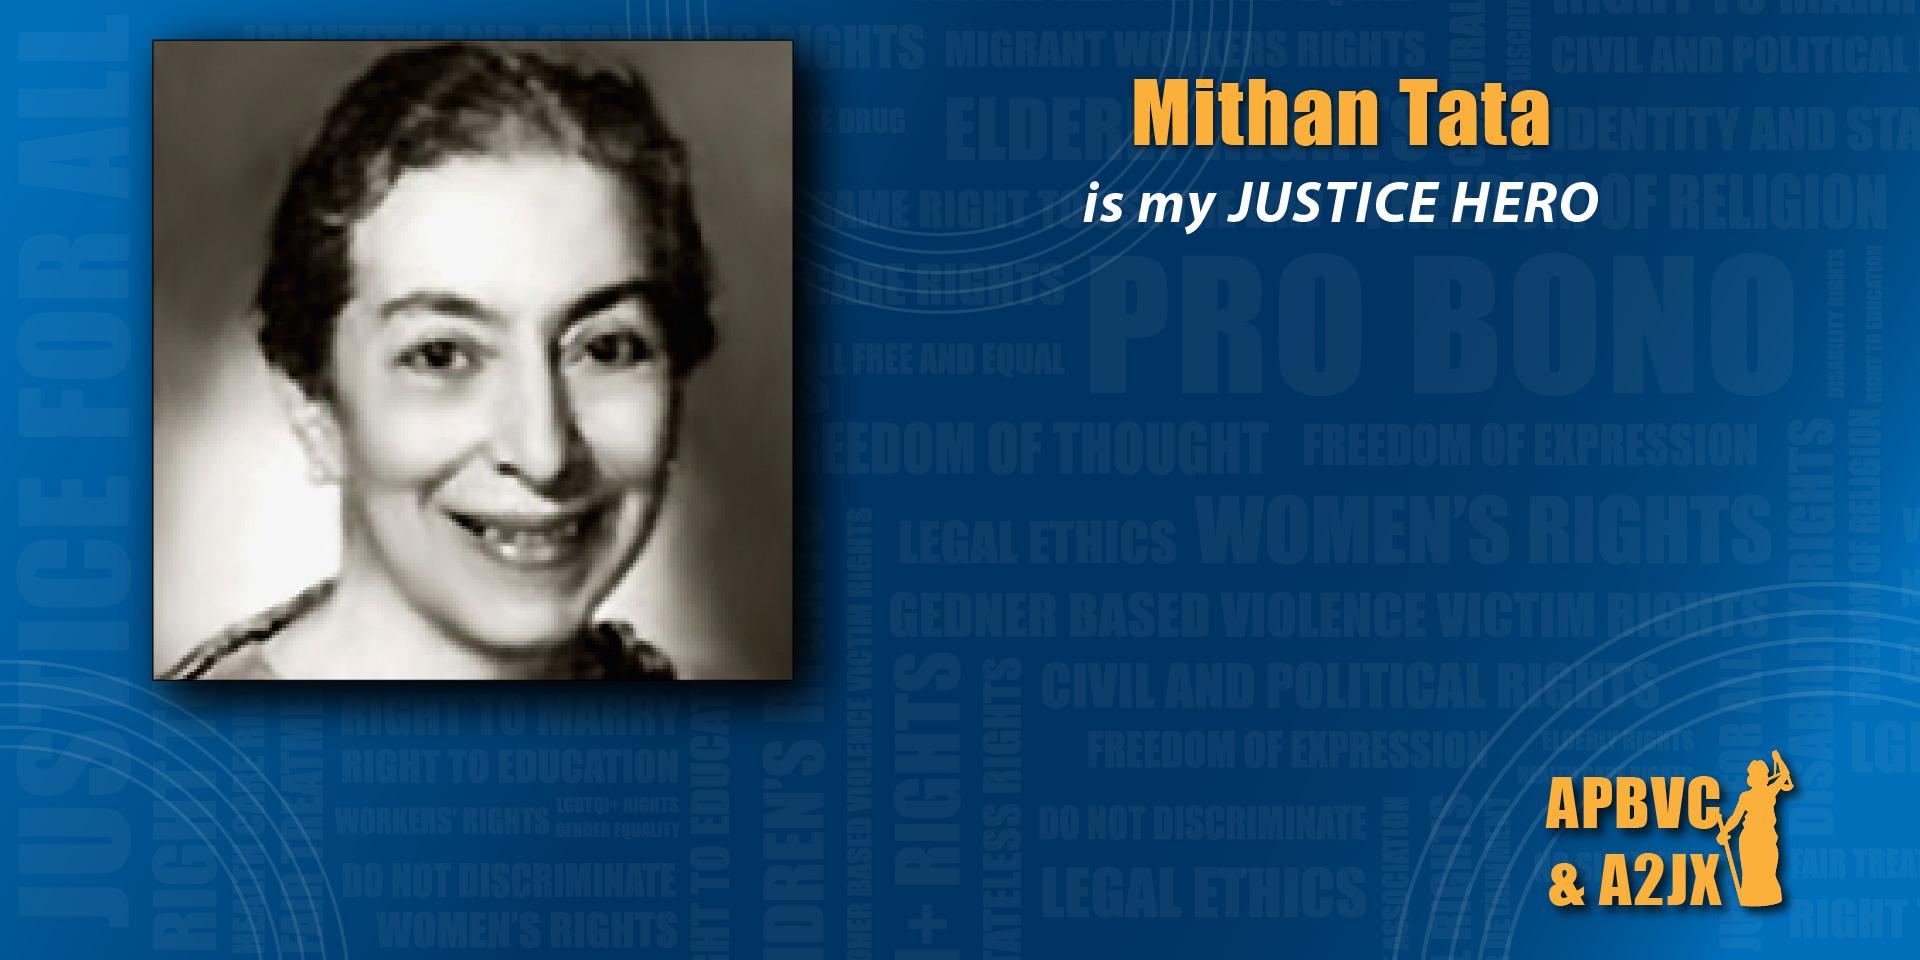 Mithan Tata